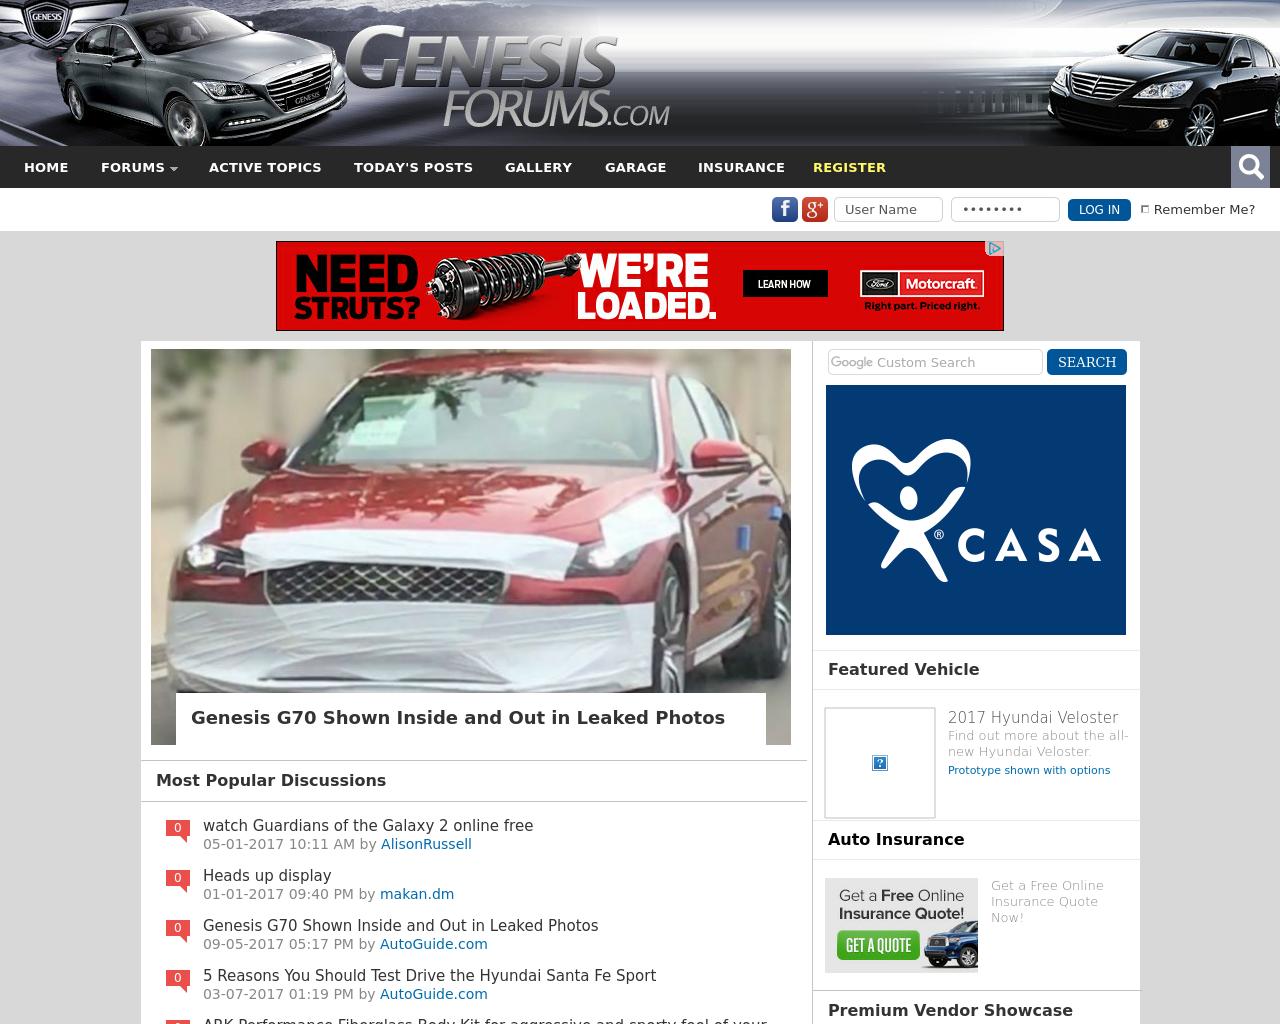 Genesis-Forums-Advertising-Reviews-Pricing